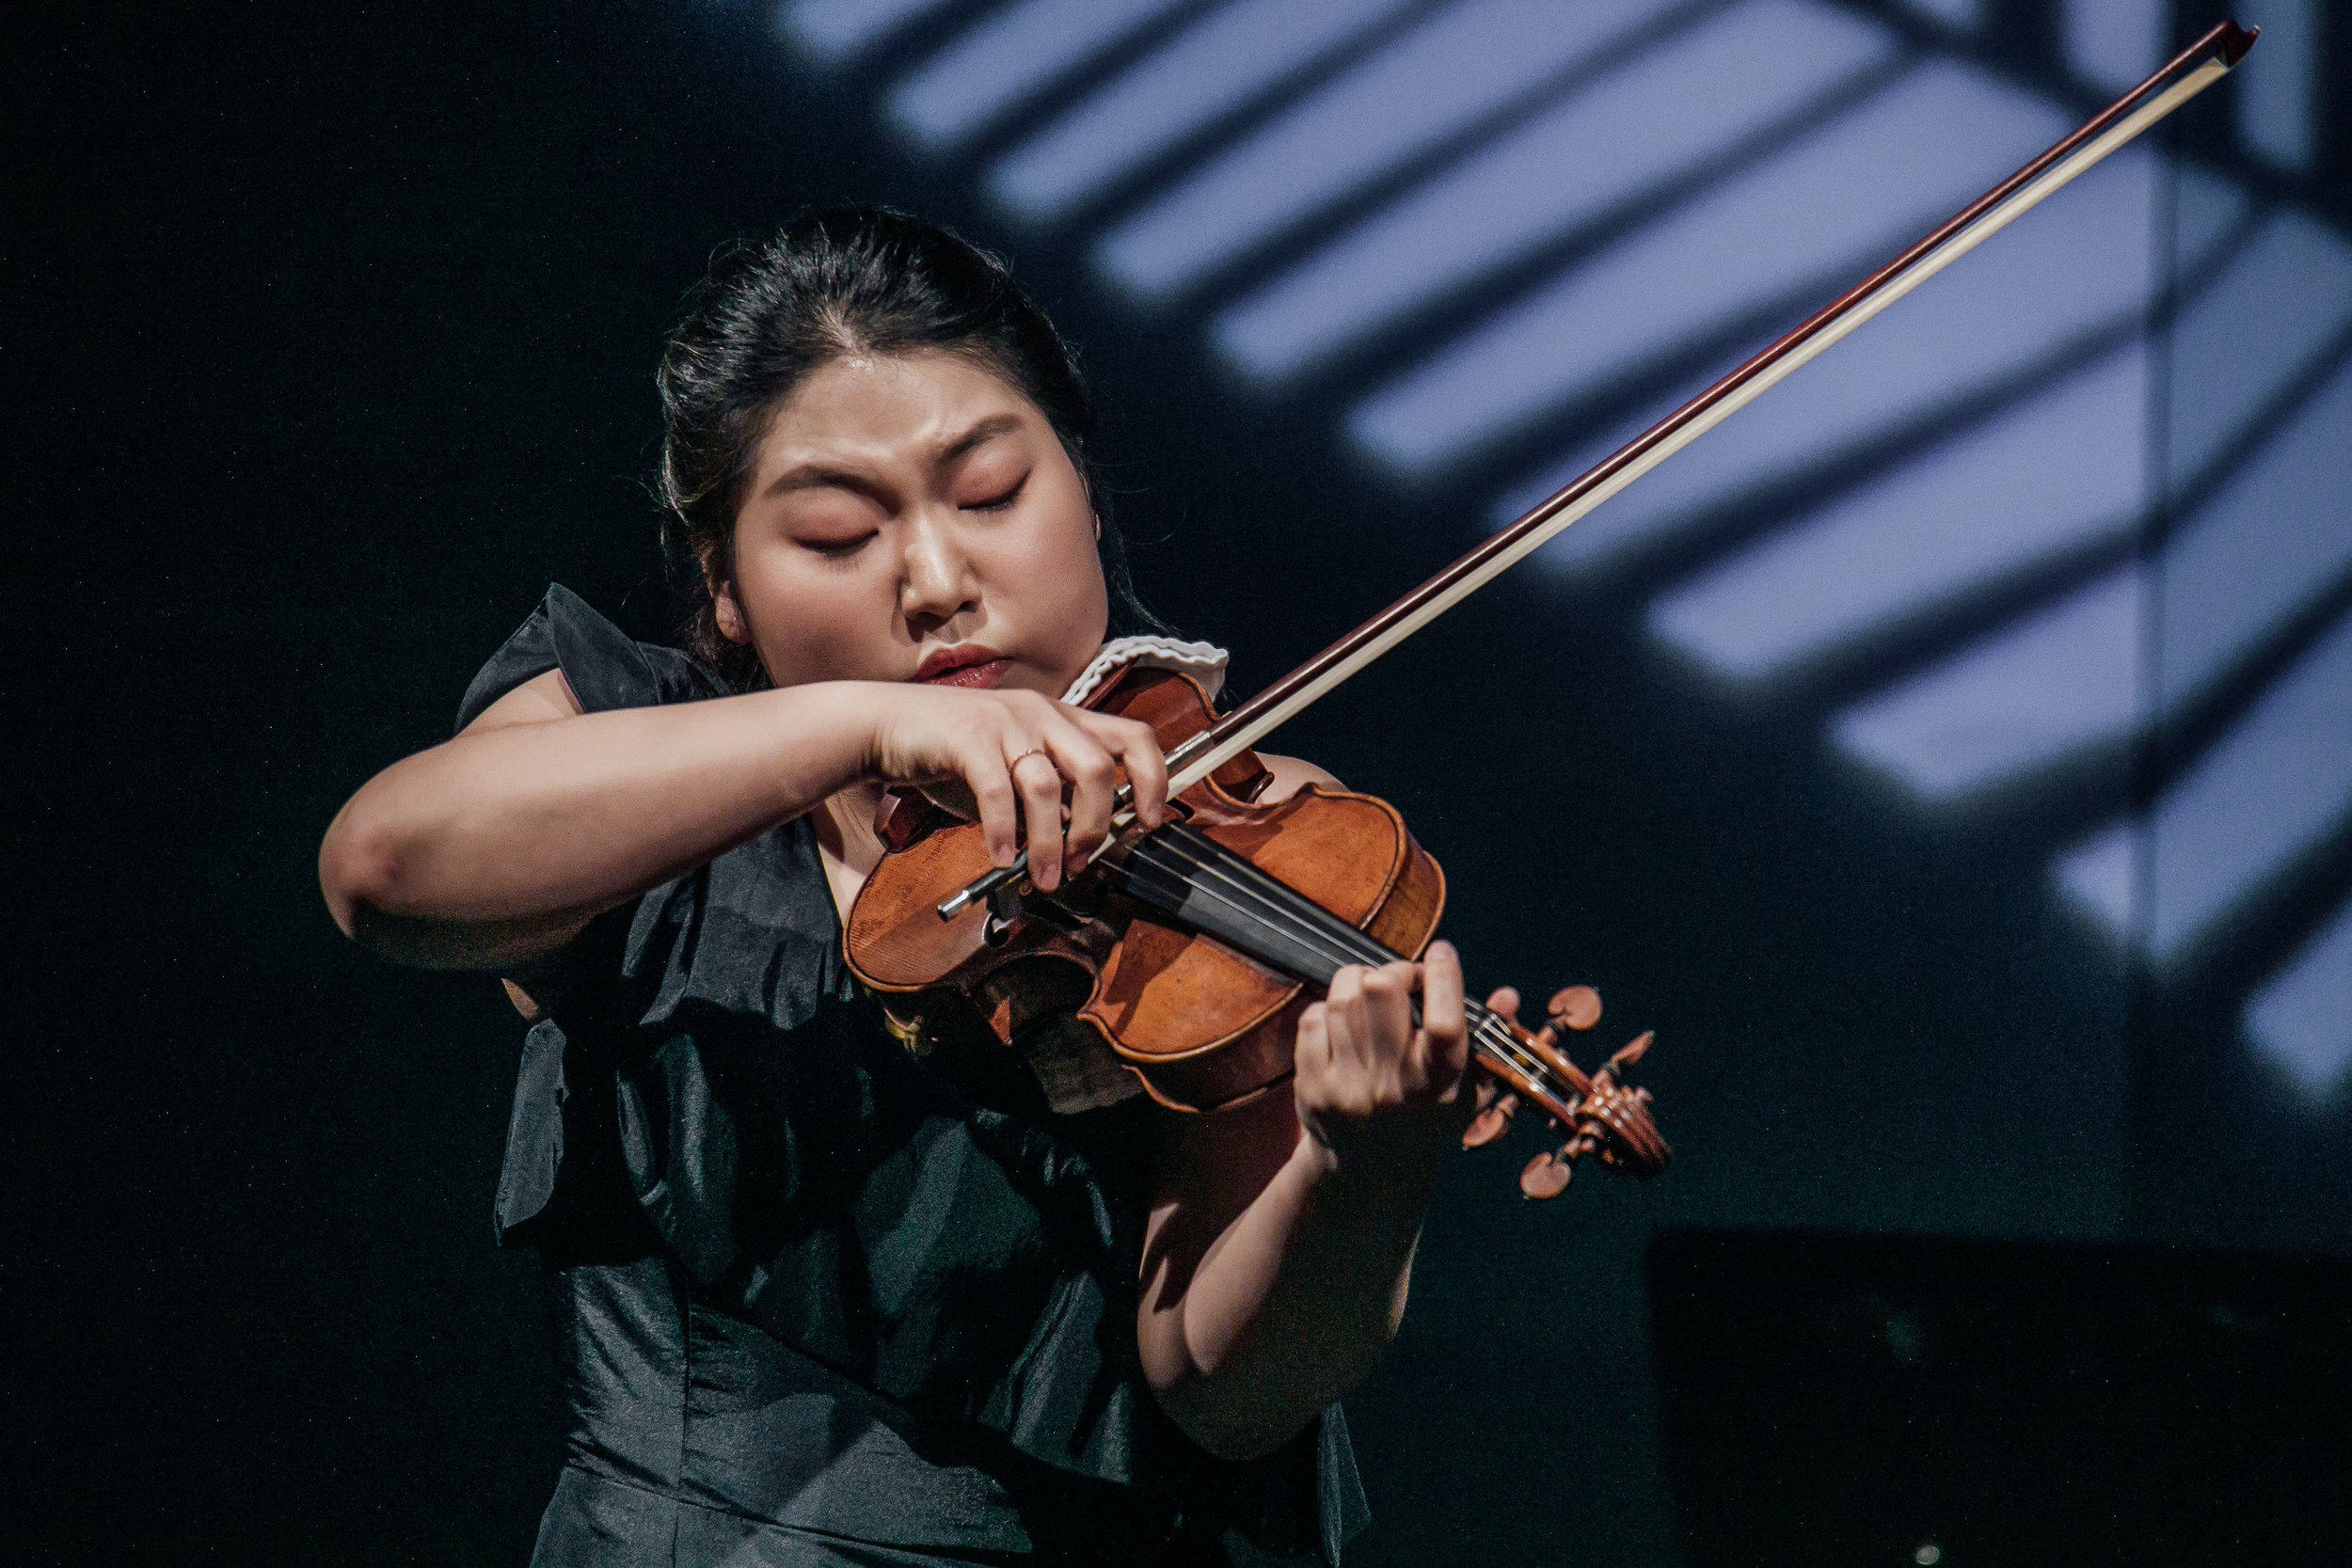 Anna Im won the 2019 Michael Hill International Violin Competition